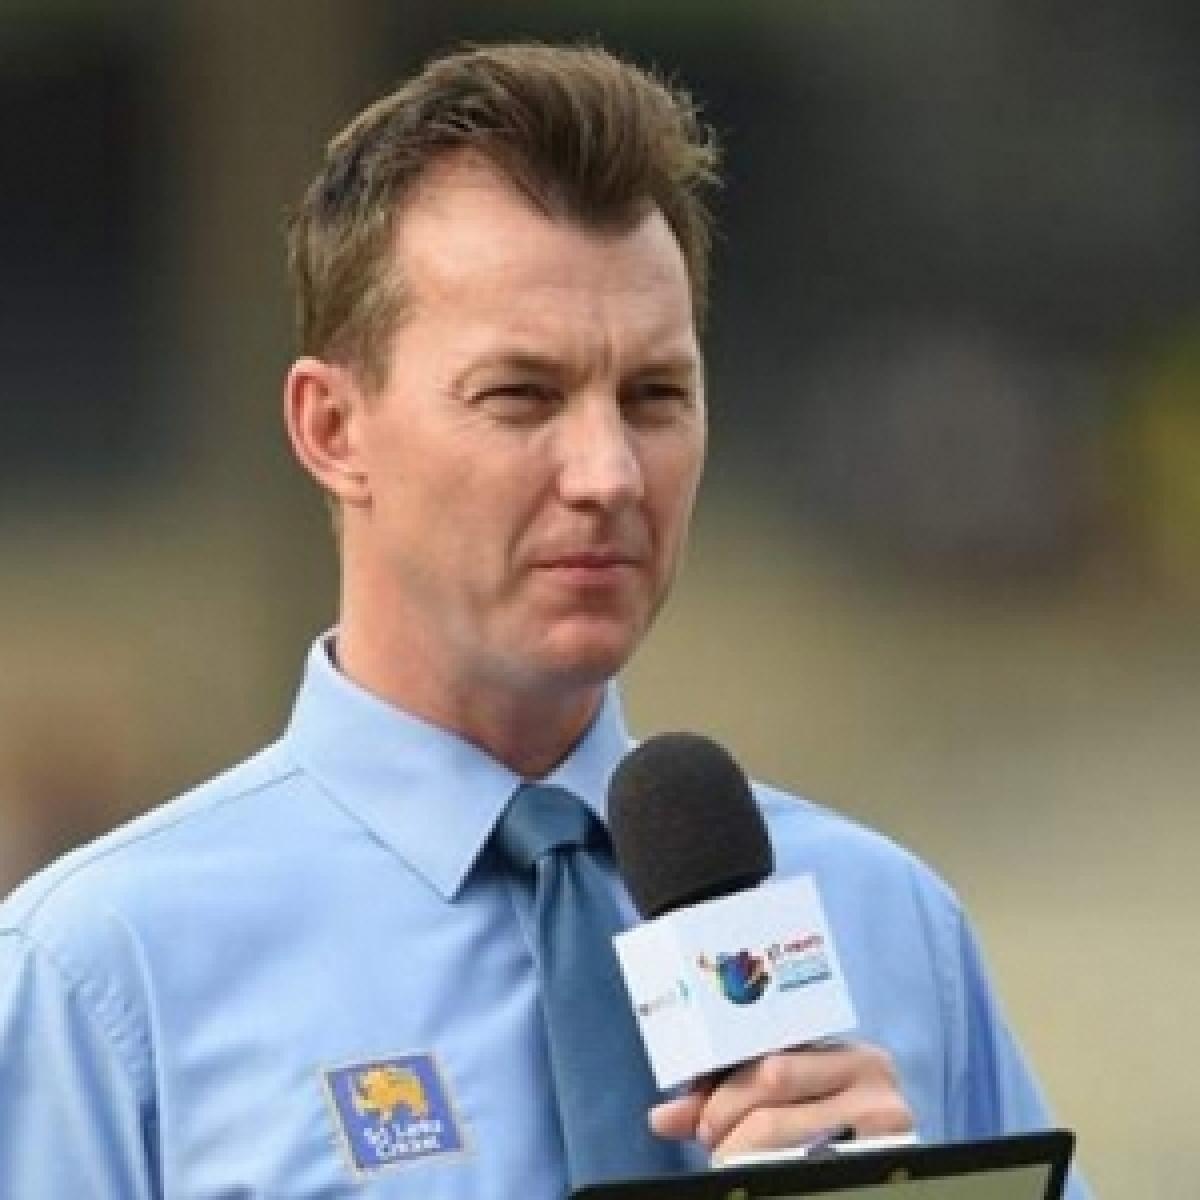 Brett Lee criticises ICC decision to ban Kagiso Rabada for next Test against England